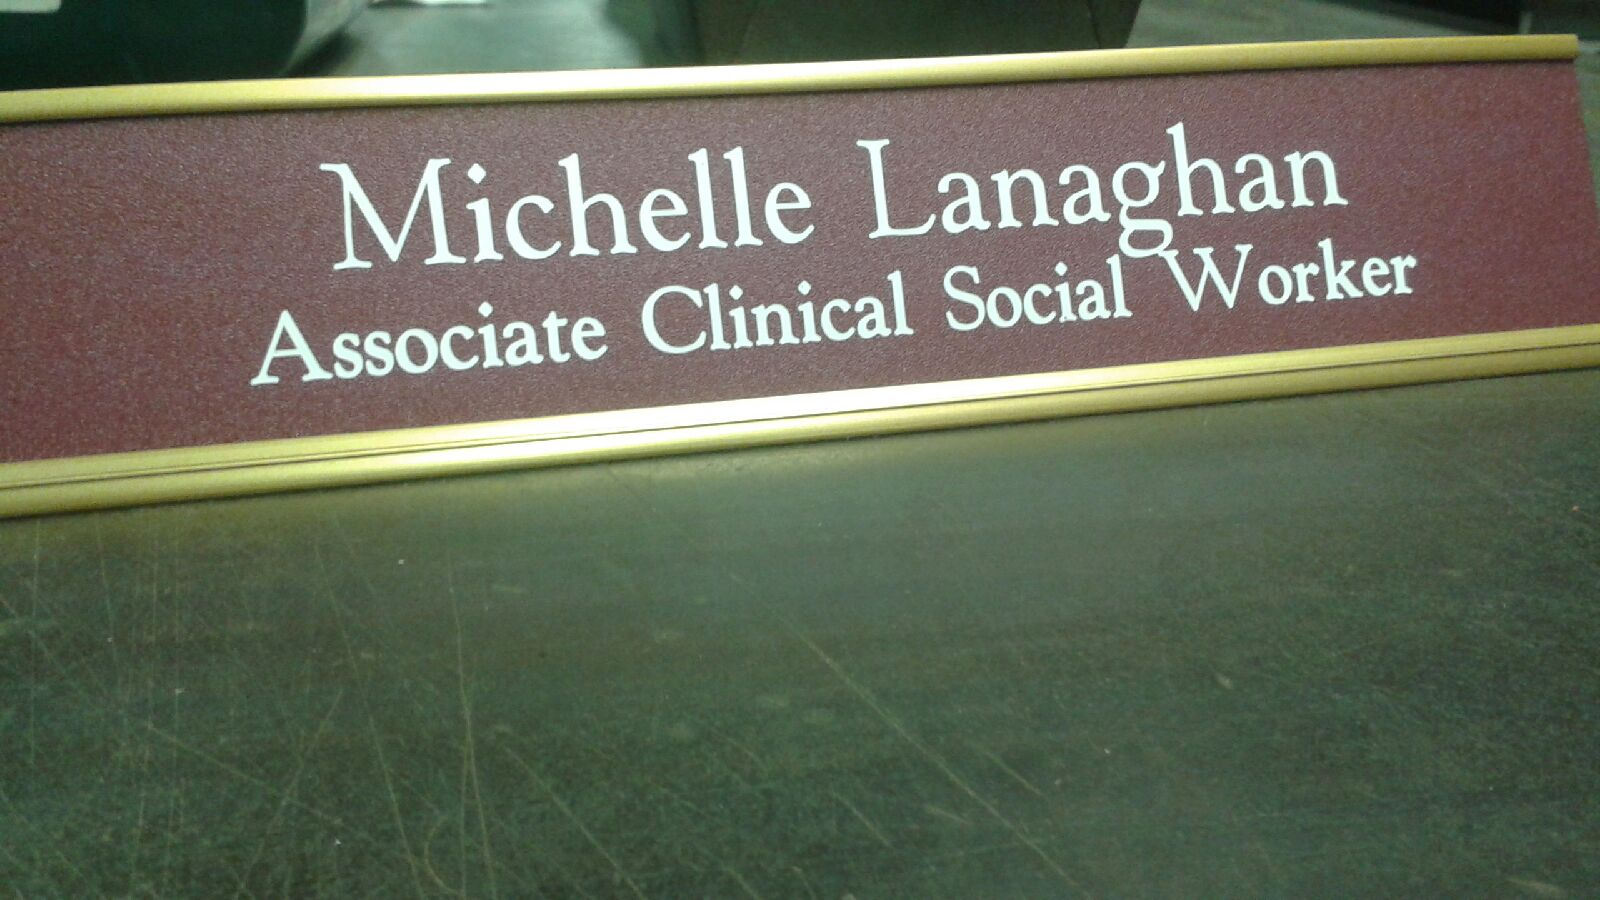 custom professional engraved nameplate